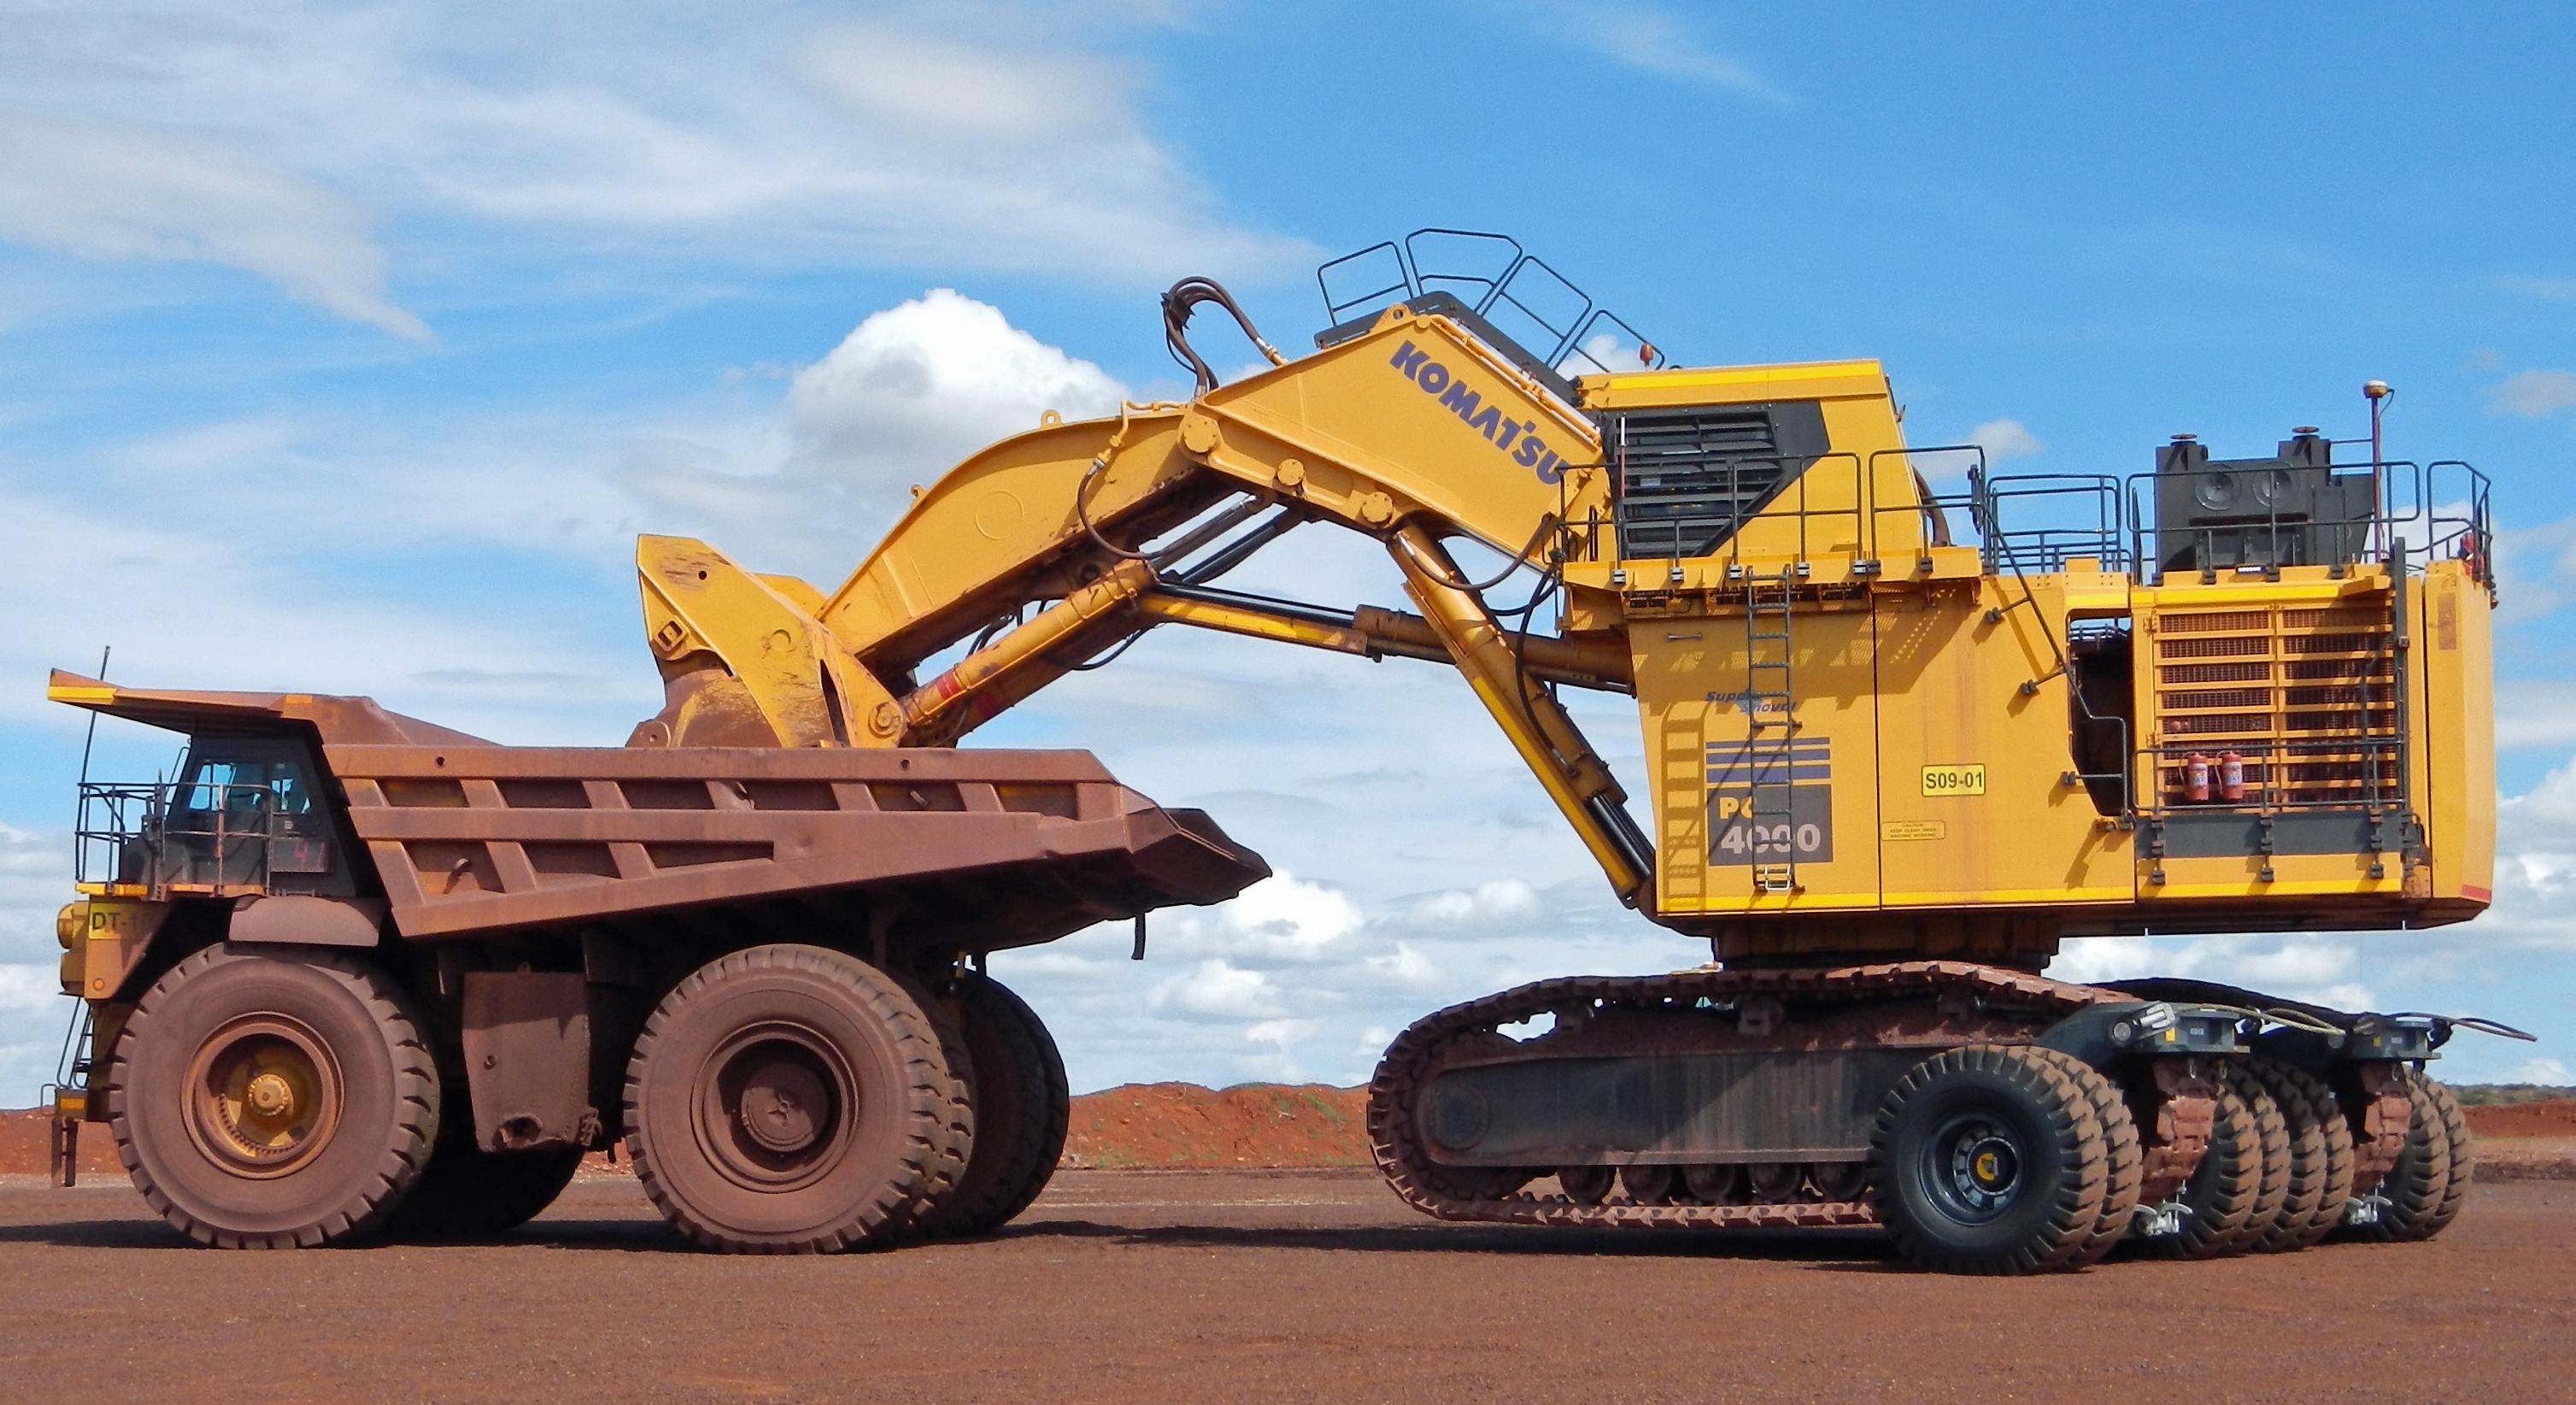 Sleipner excavator transporting systems